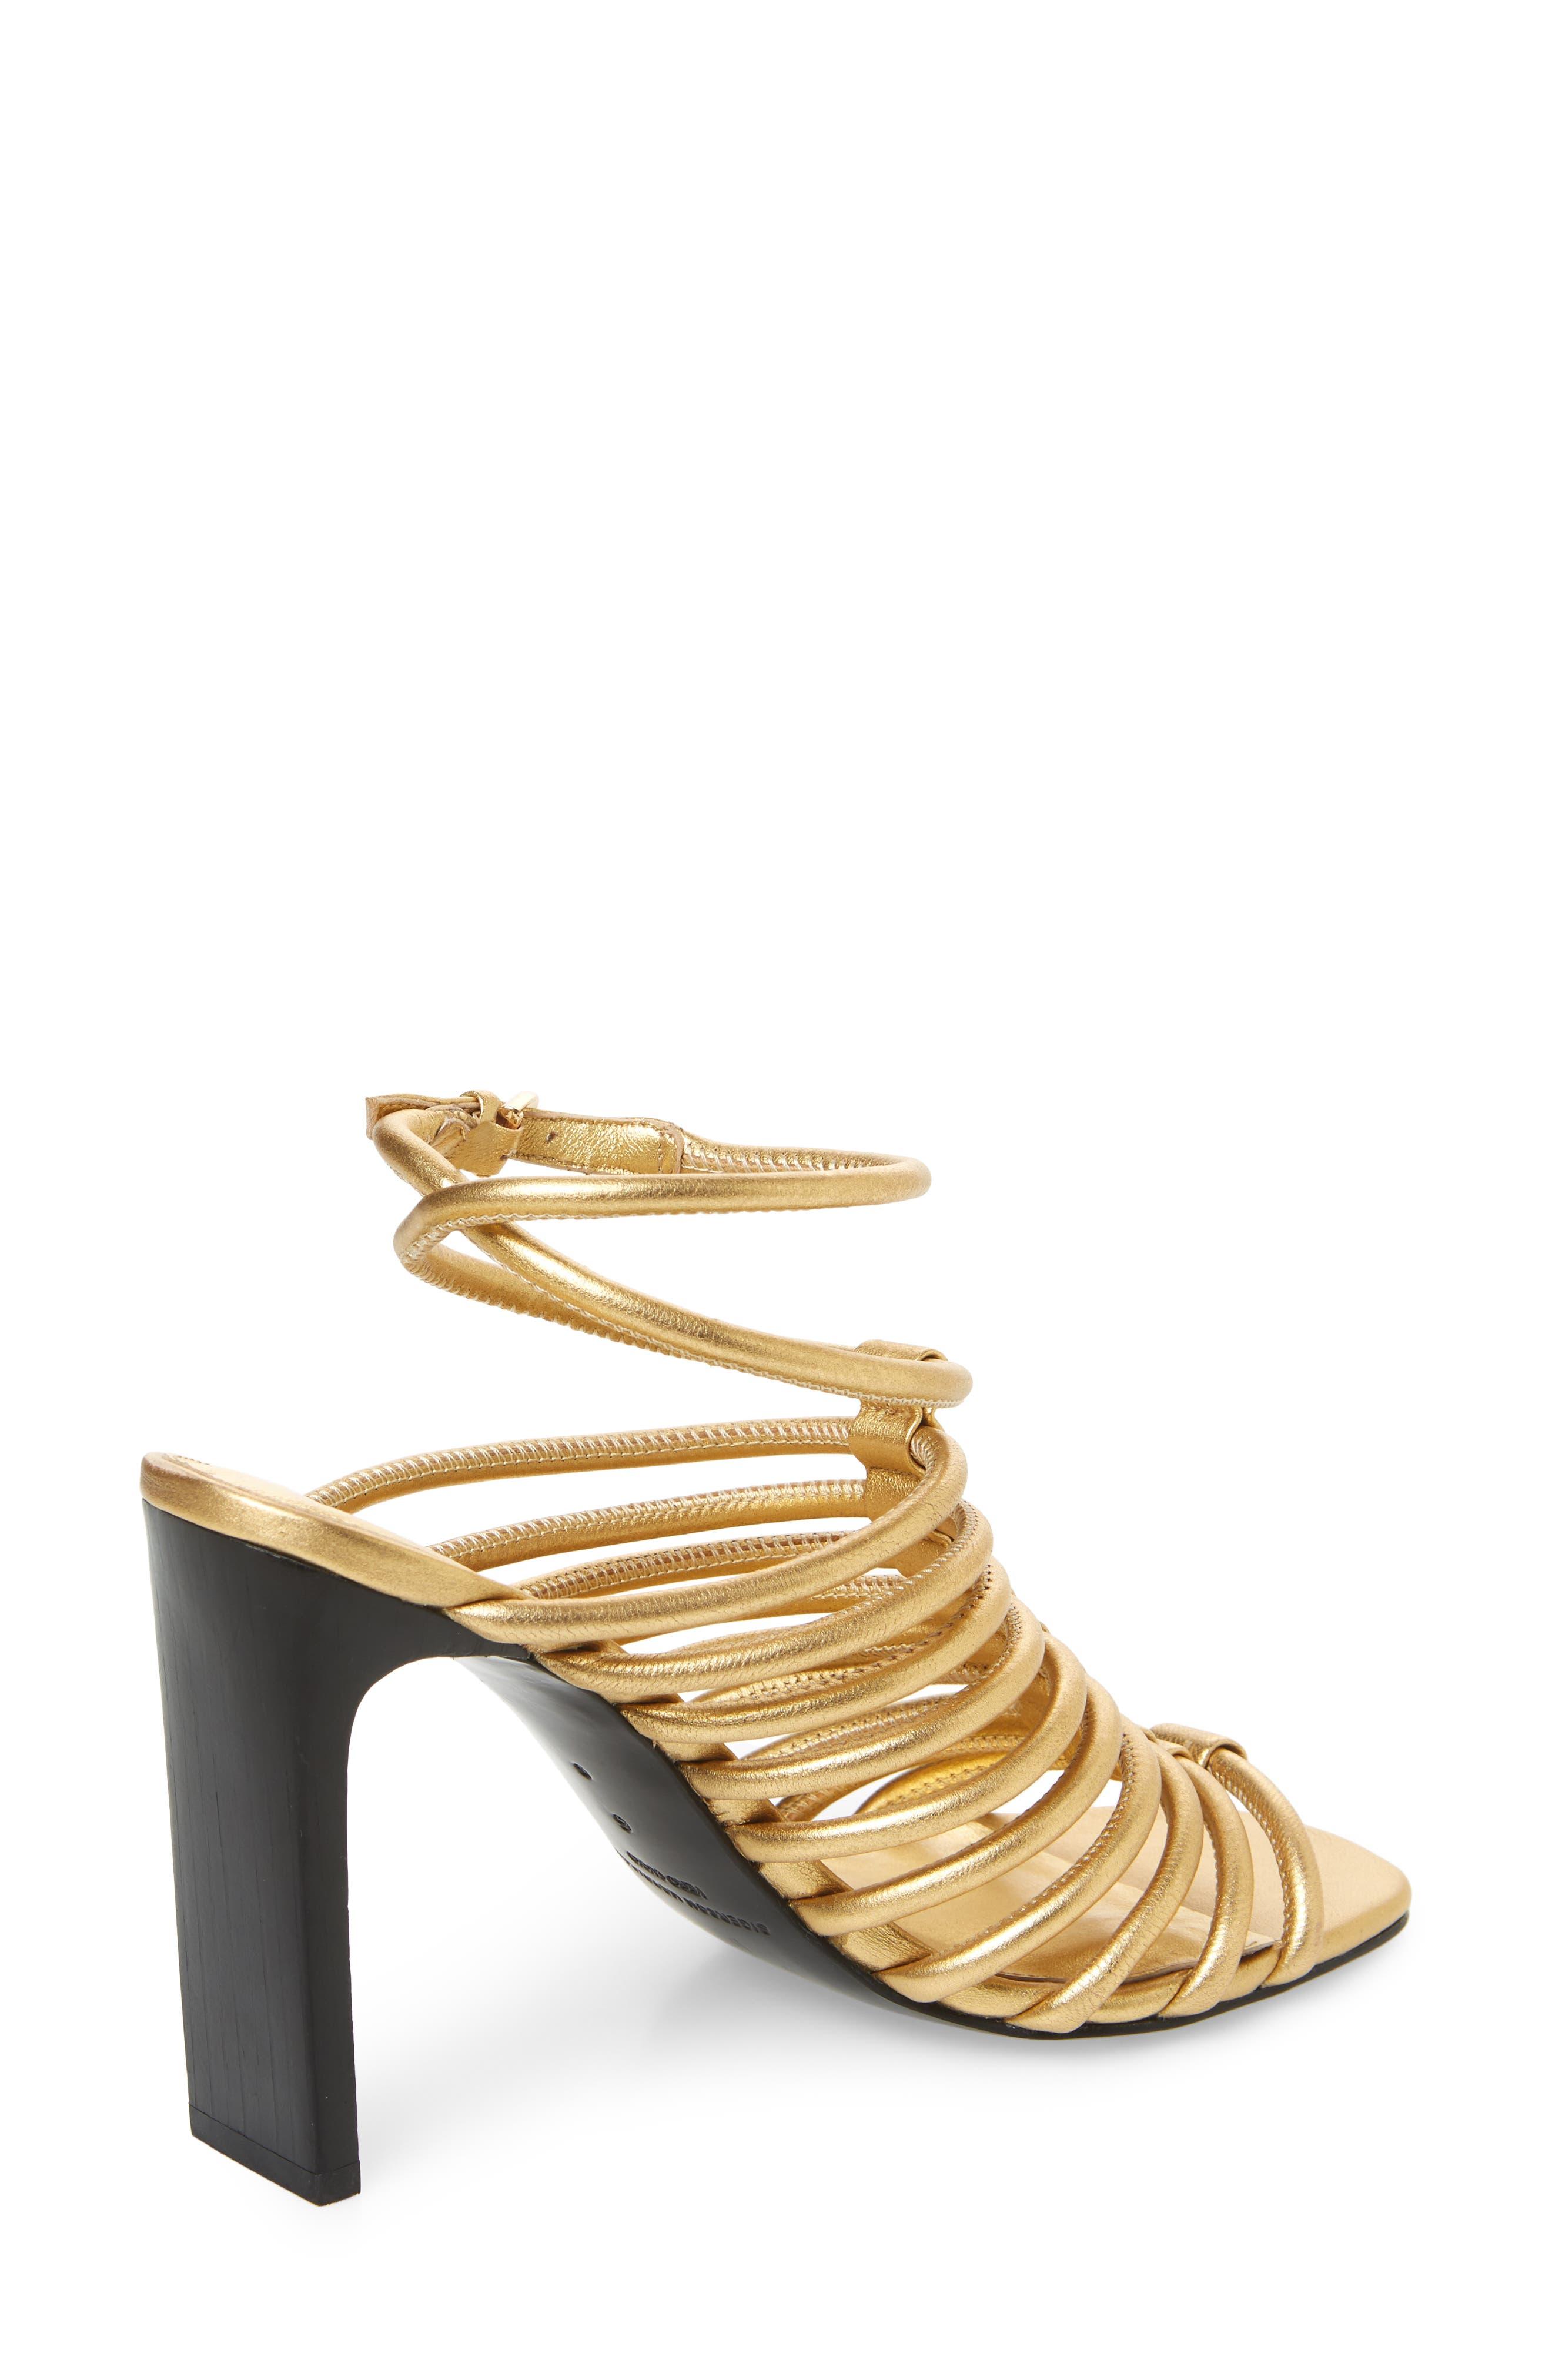 HH Caged Ankle Strap Sandal,                             Alternate thumbnail 2, color,